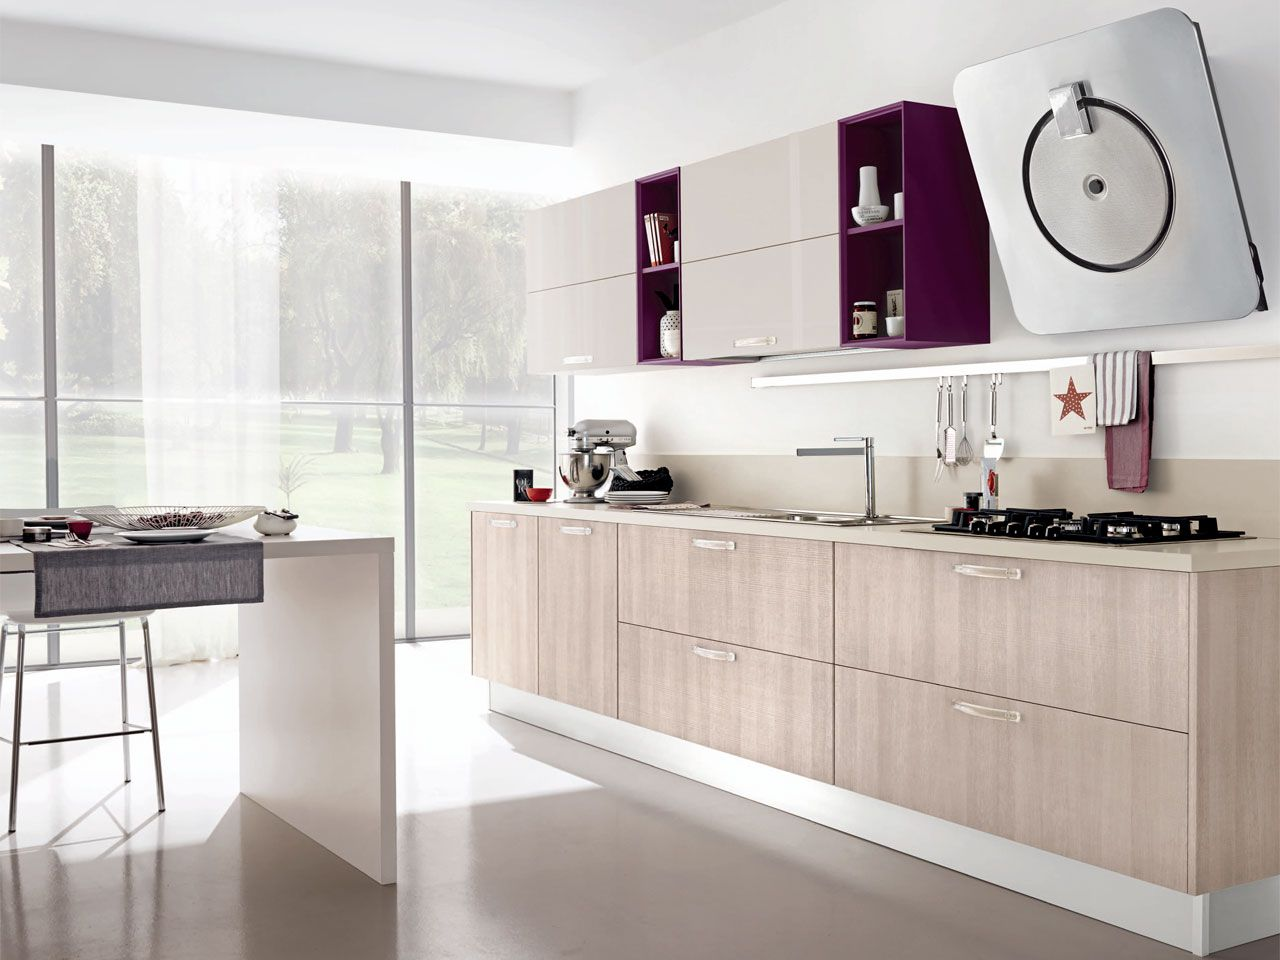 Cucine Moderne Lube - Modello Fabiana | Home decor | Pinterest ...